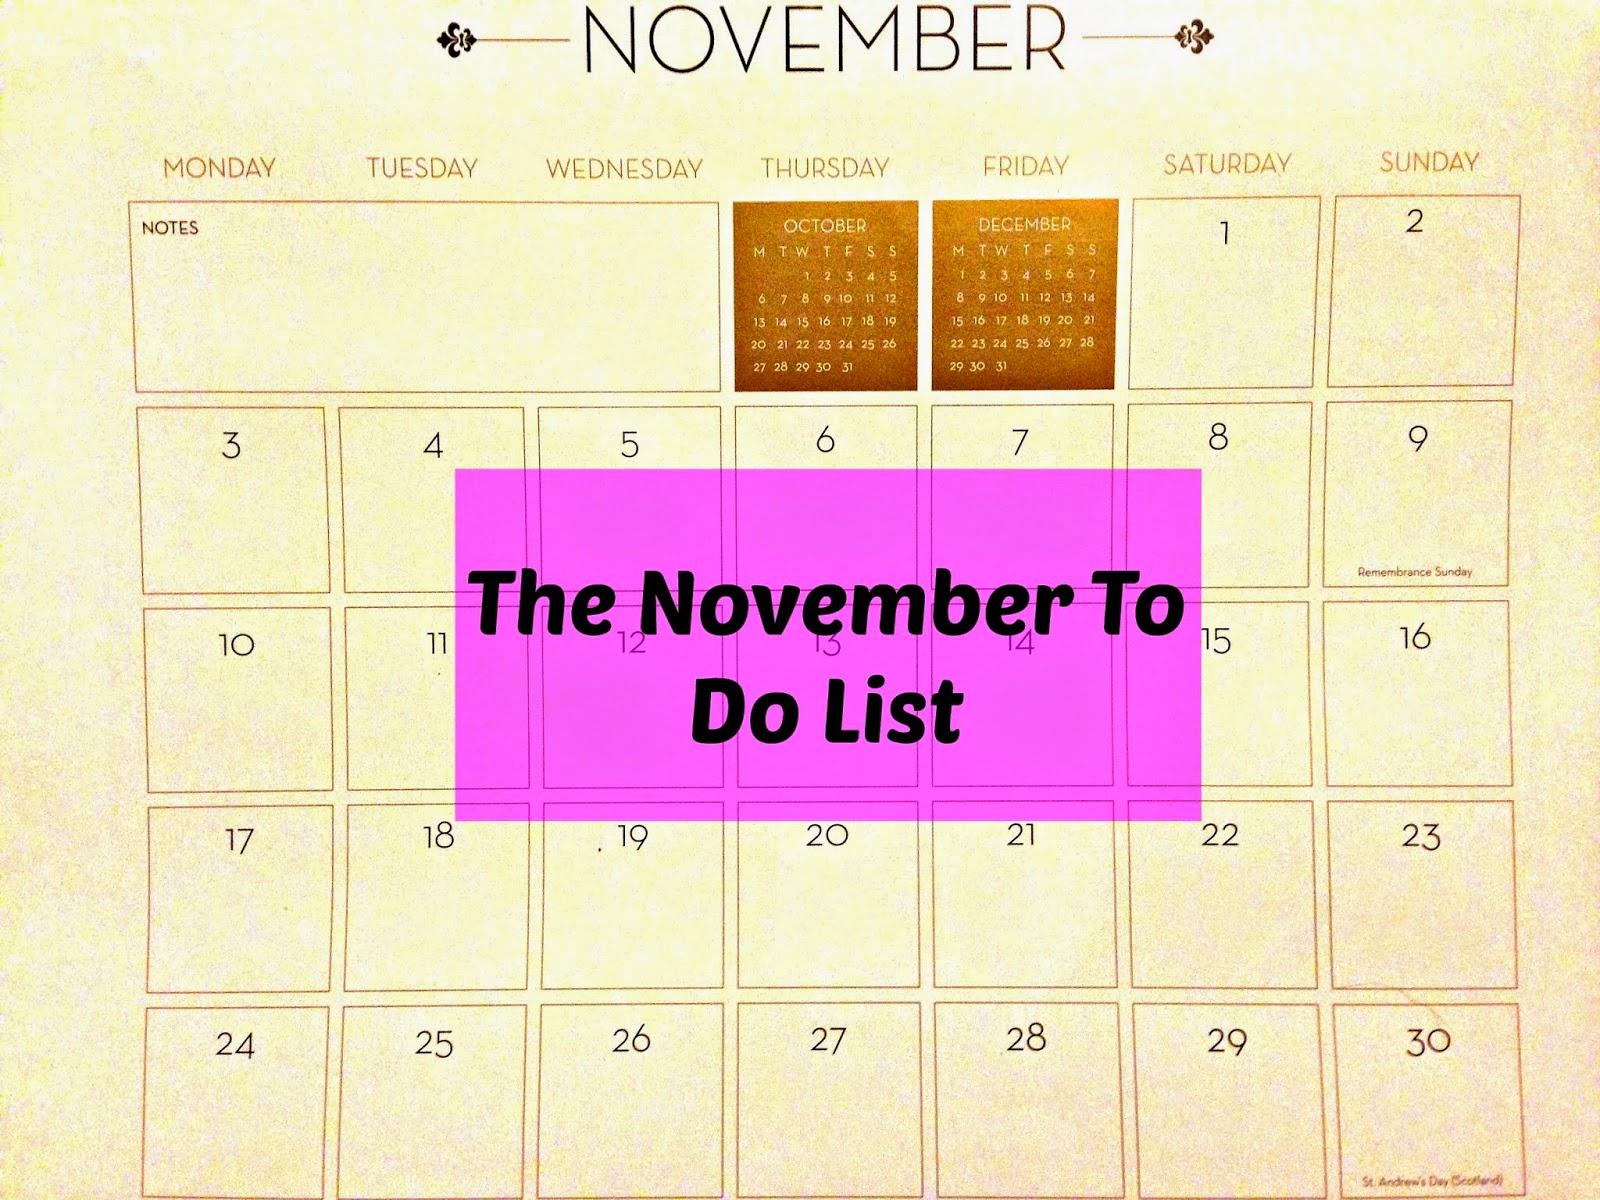 The November To Do List